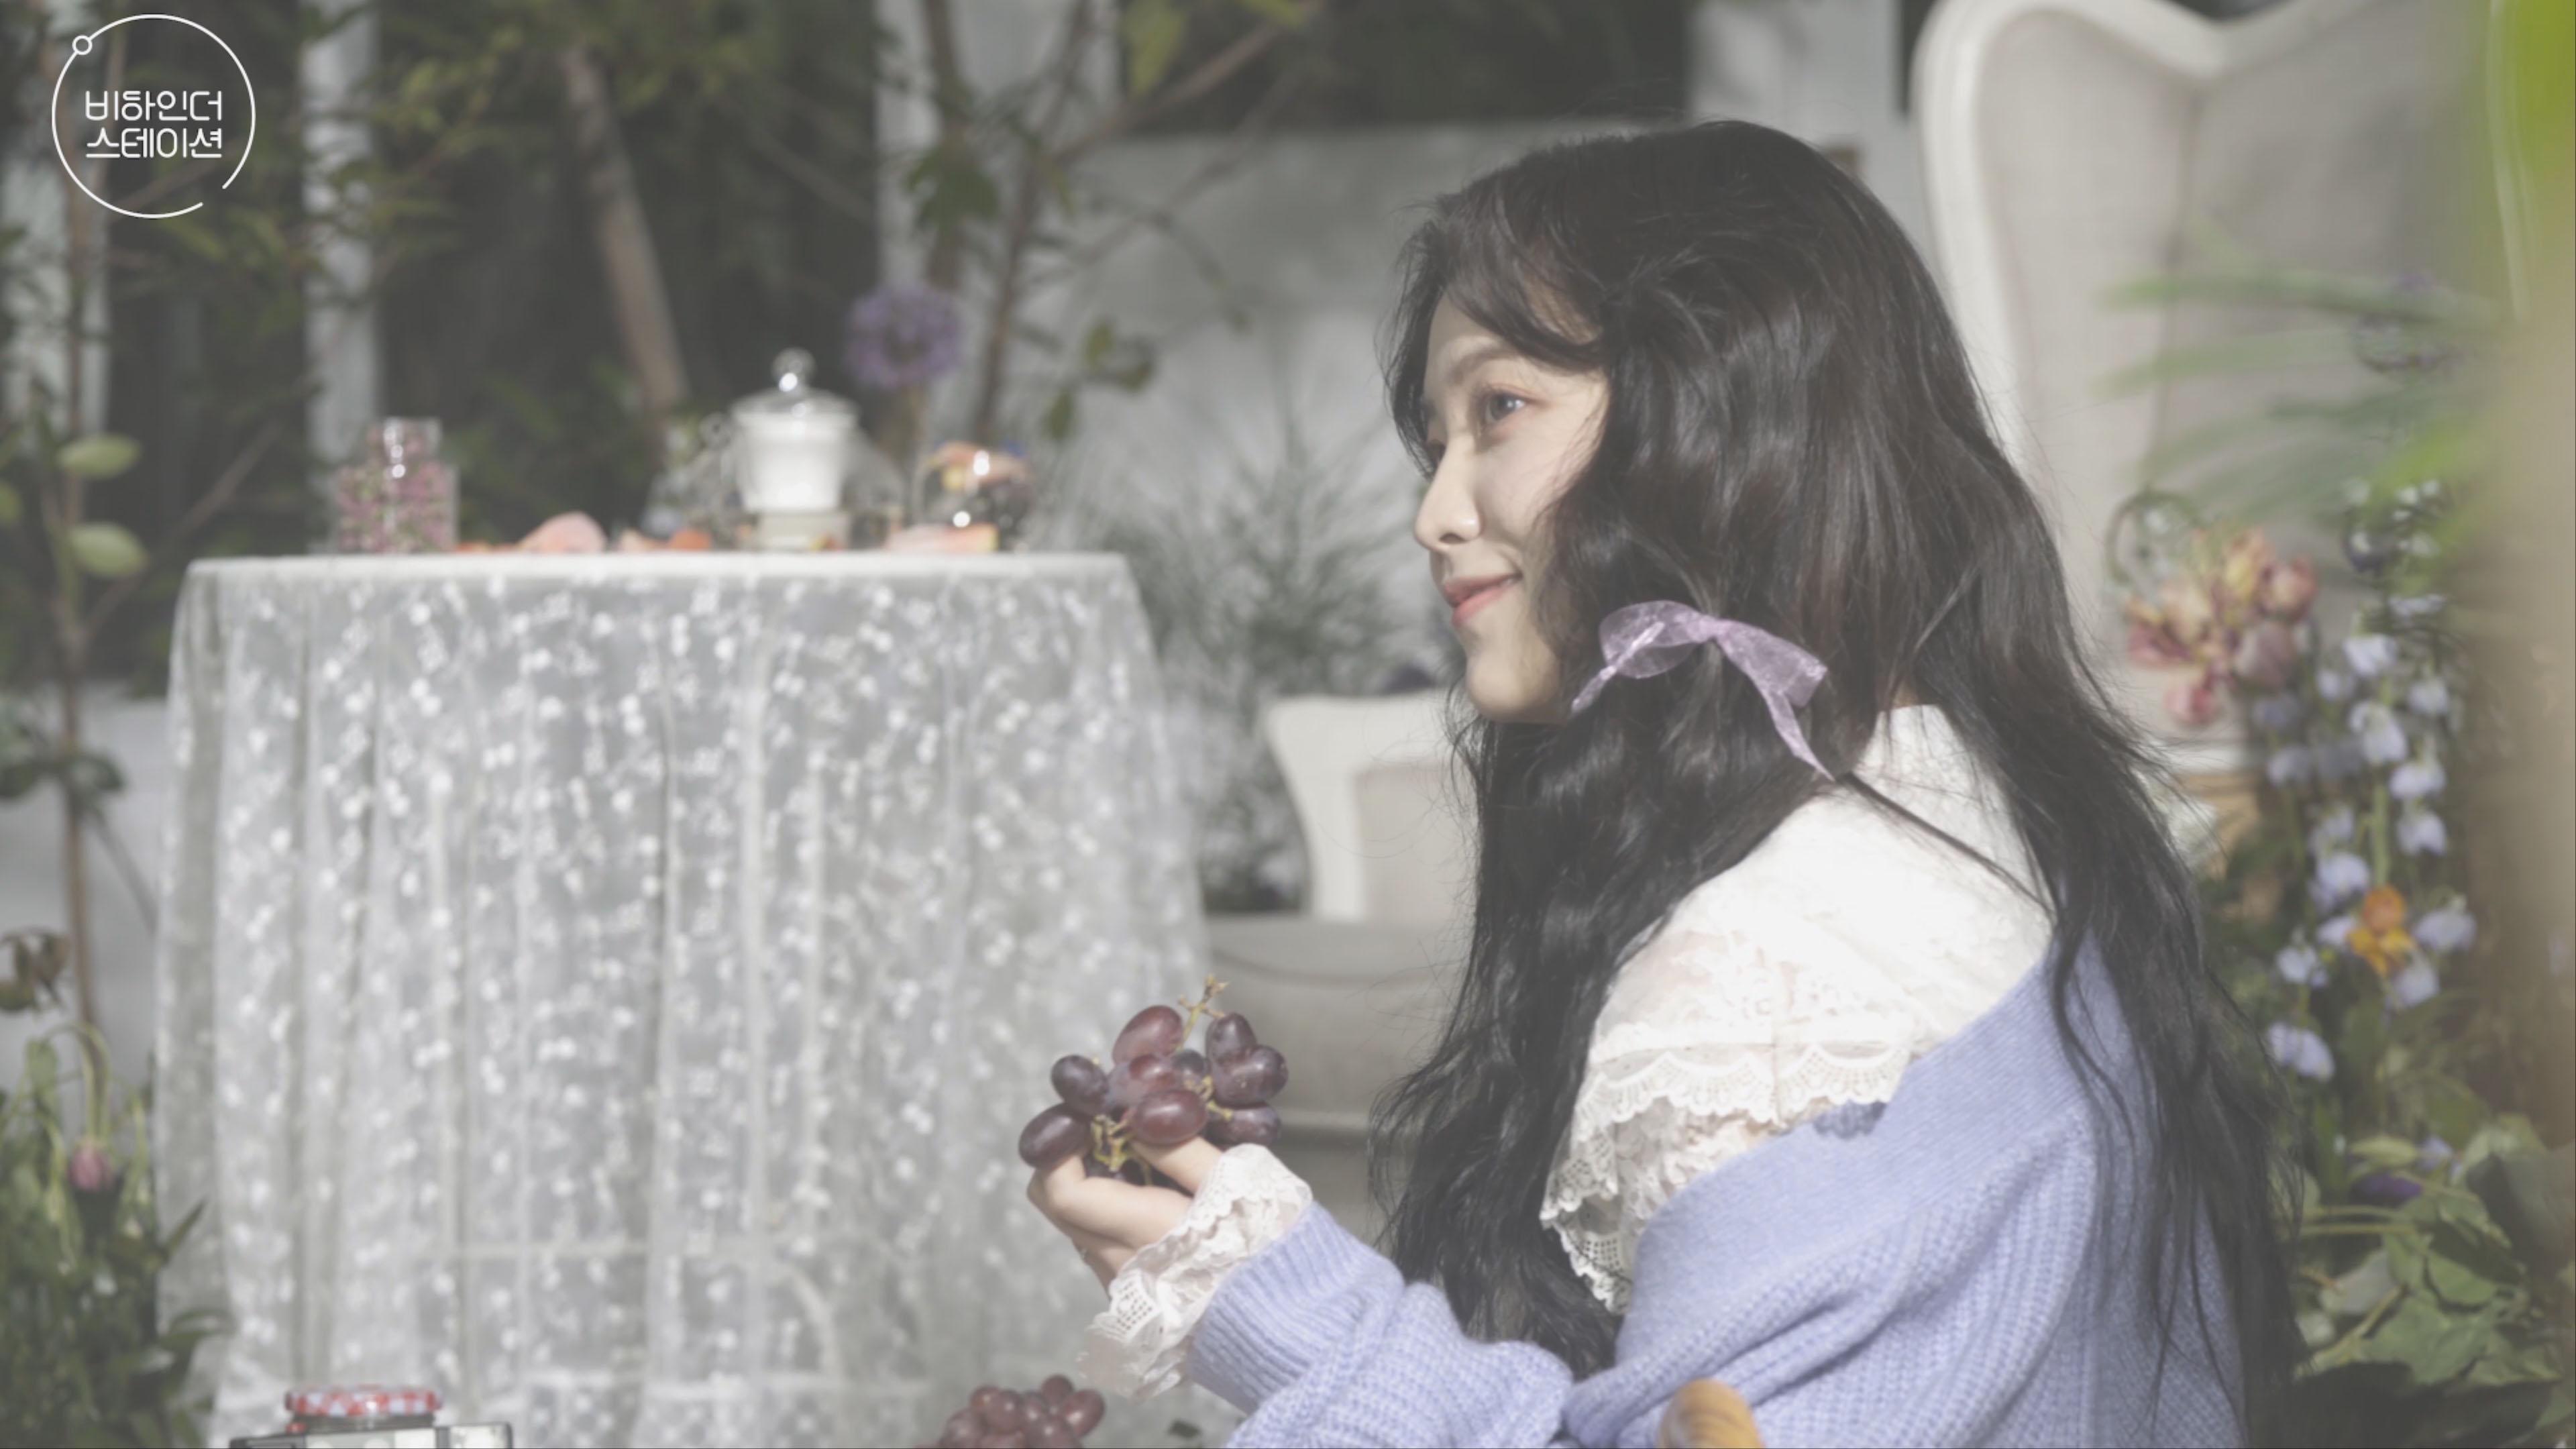 [STATION 3] YERI 예리 '스물에게 (Dear Diary)' 비하인더스테이션 #2 MV Making Film